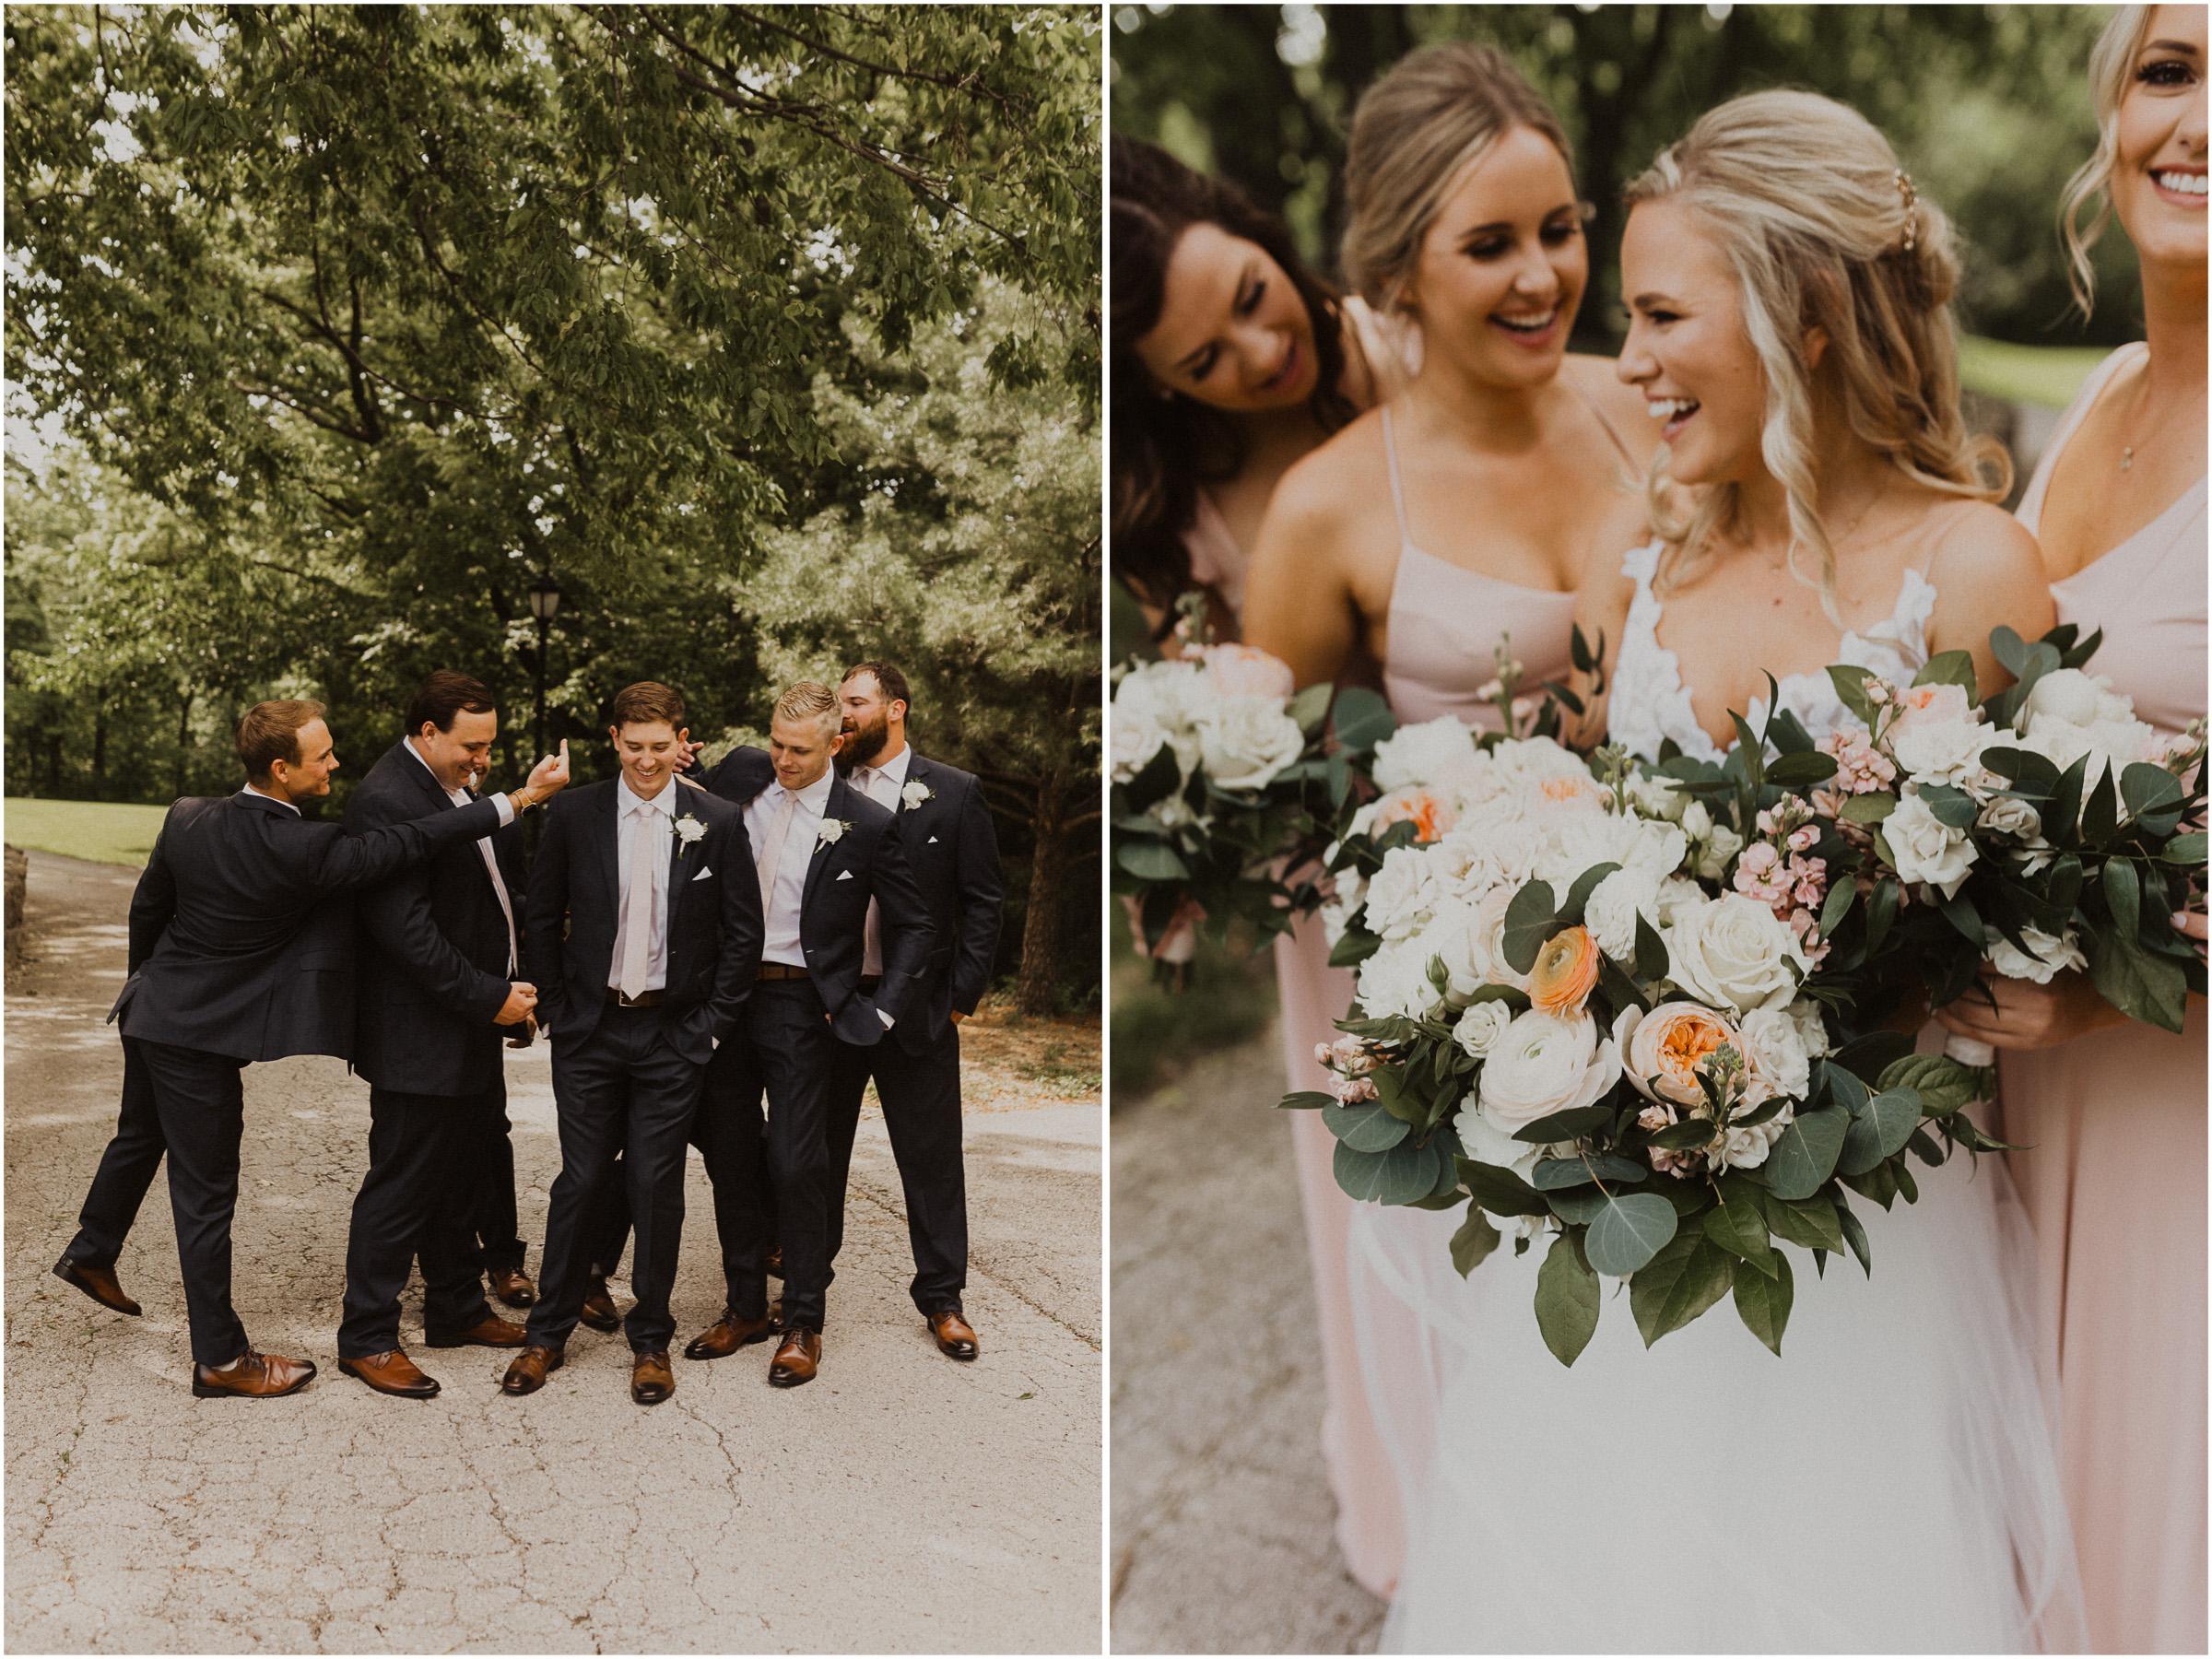 alyssa barletter photography hawthorne house summer outdoor wedding southern charm inspiration-23.jpg